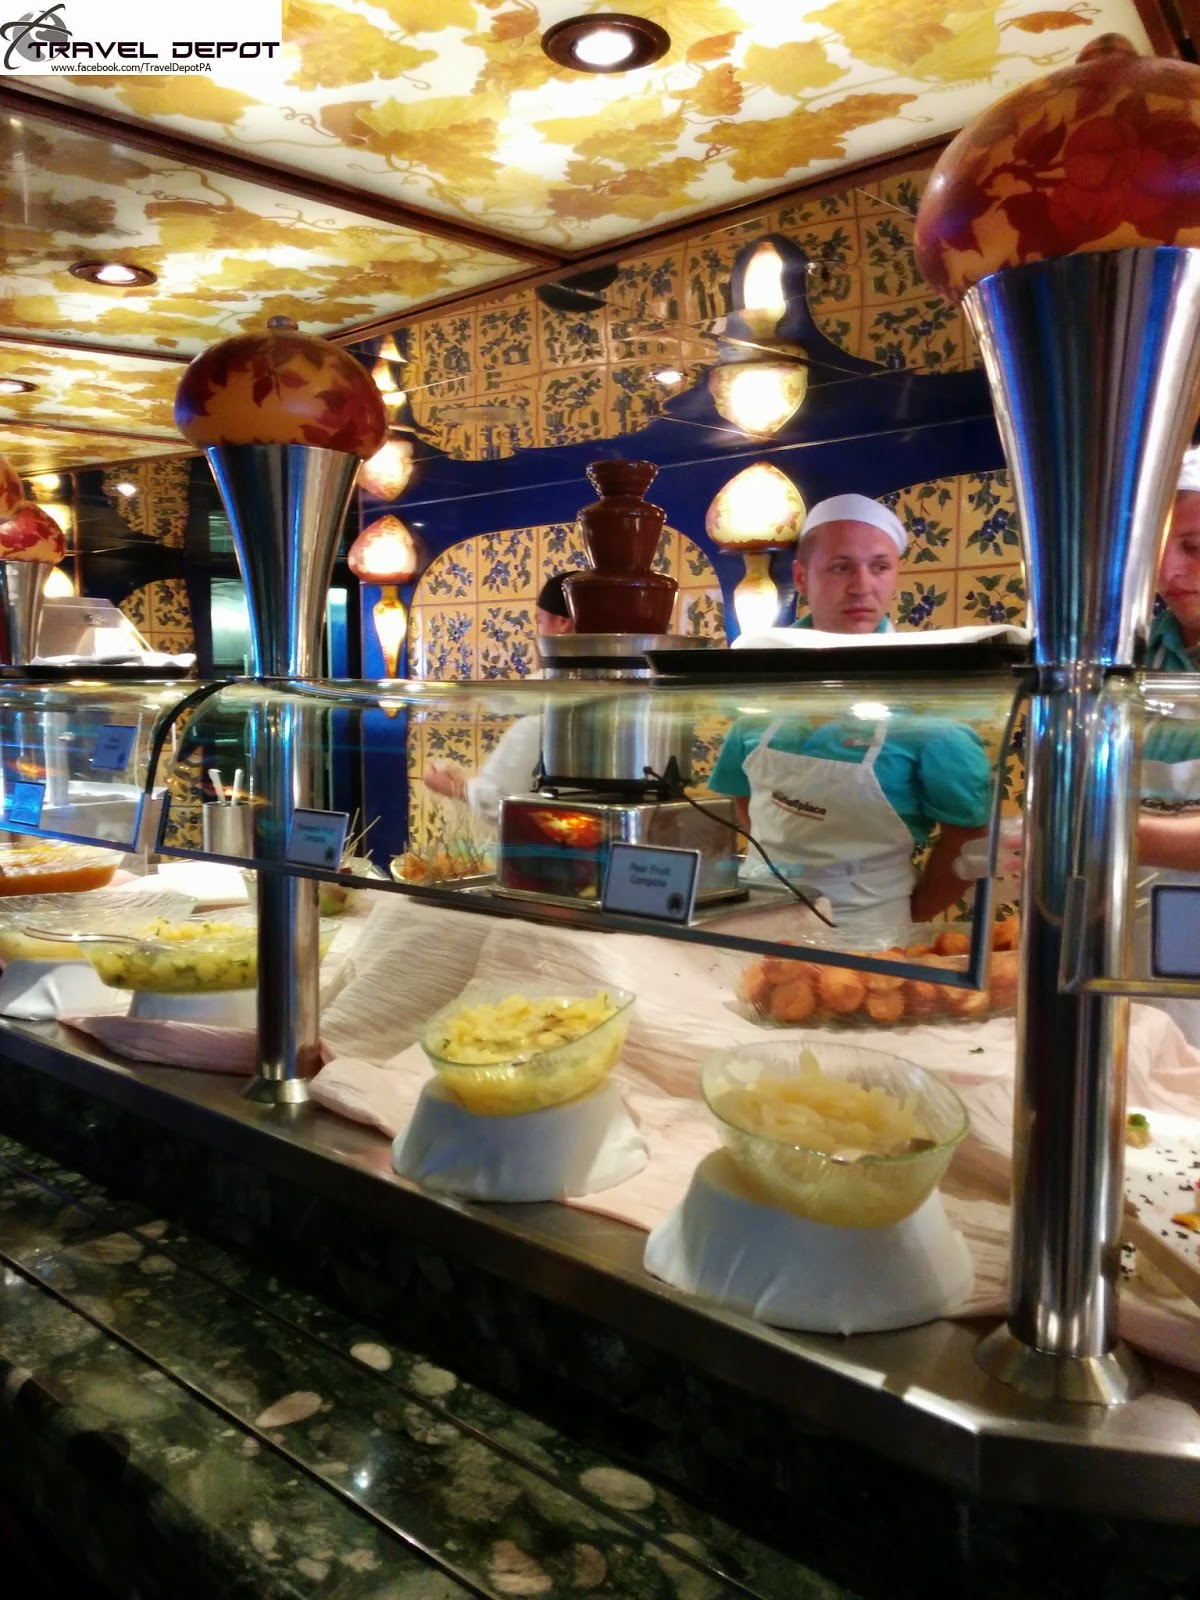 Yummy Food Aboard The Carnival Liberty Travel Depot